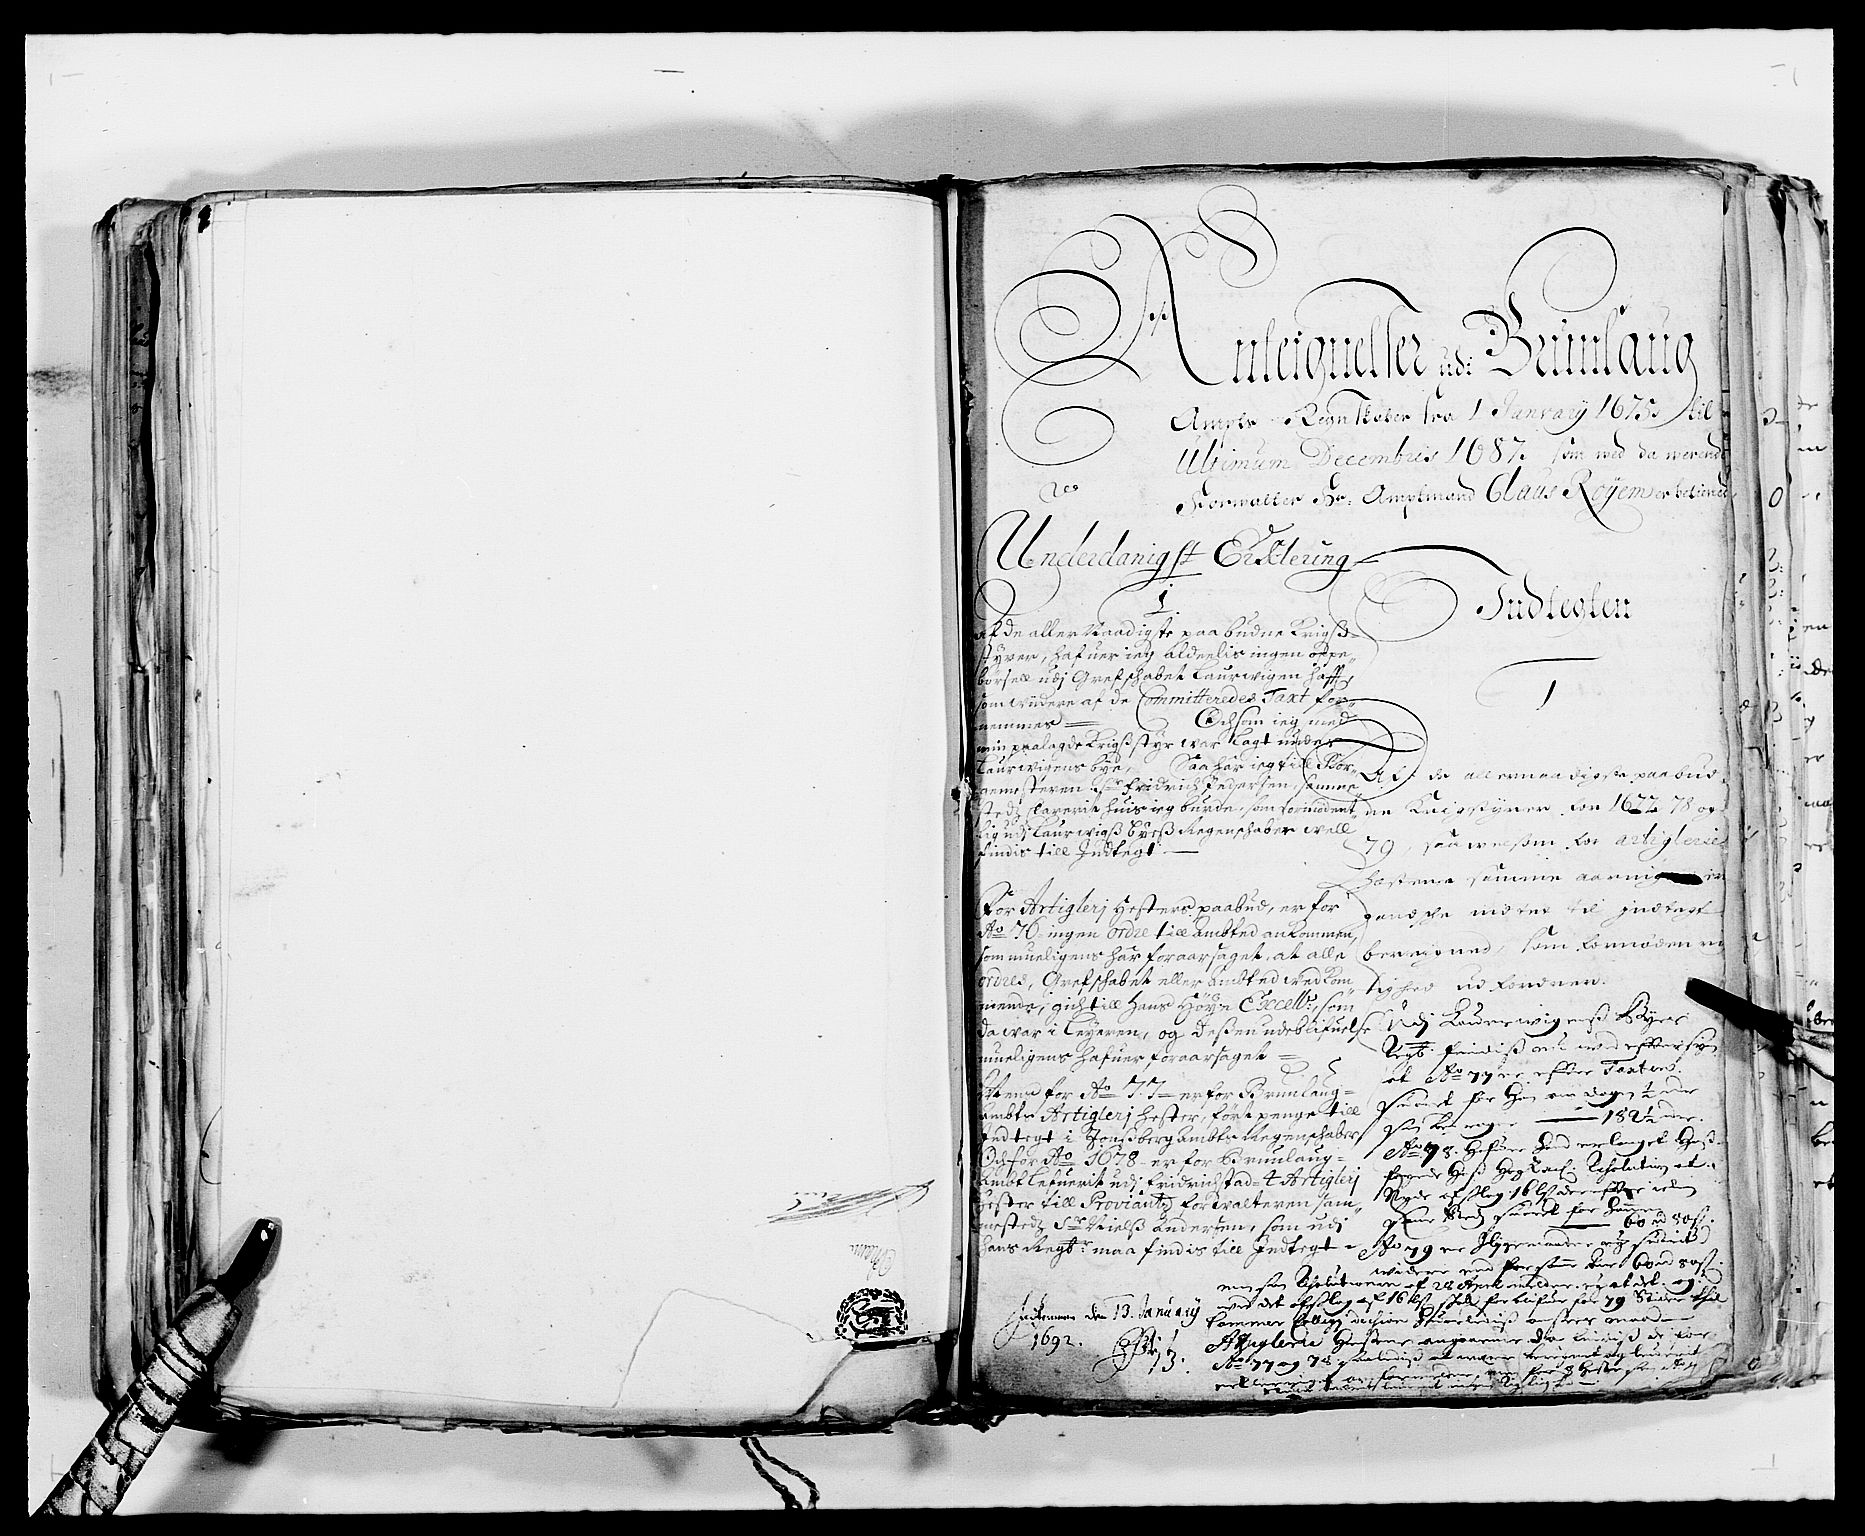 RA, Rentekammeret inntil 1814, Reviderte regnskaper, Fogderegnskap, R32/L1863: Fogderegnskap Jarlsberg grevskap, 1659-1687, s. 150